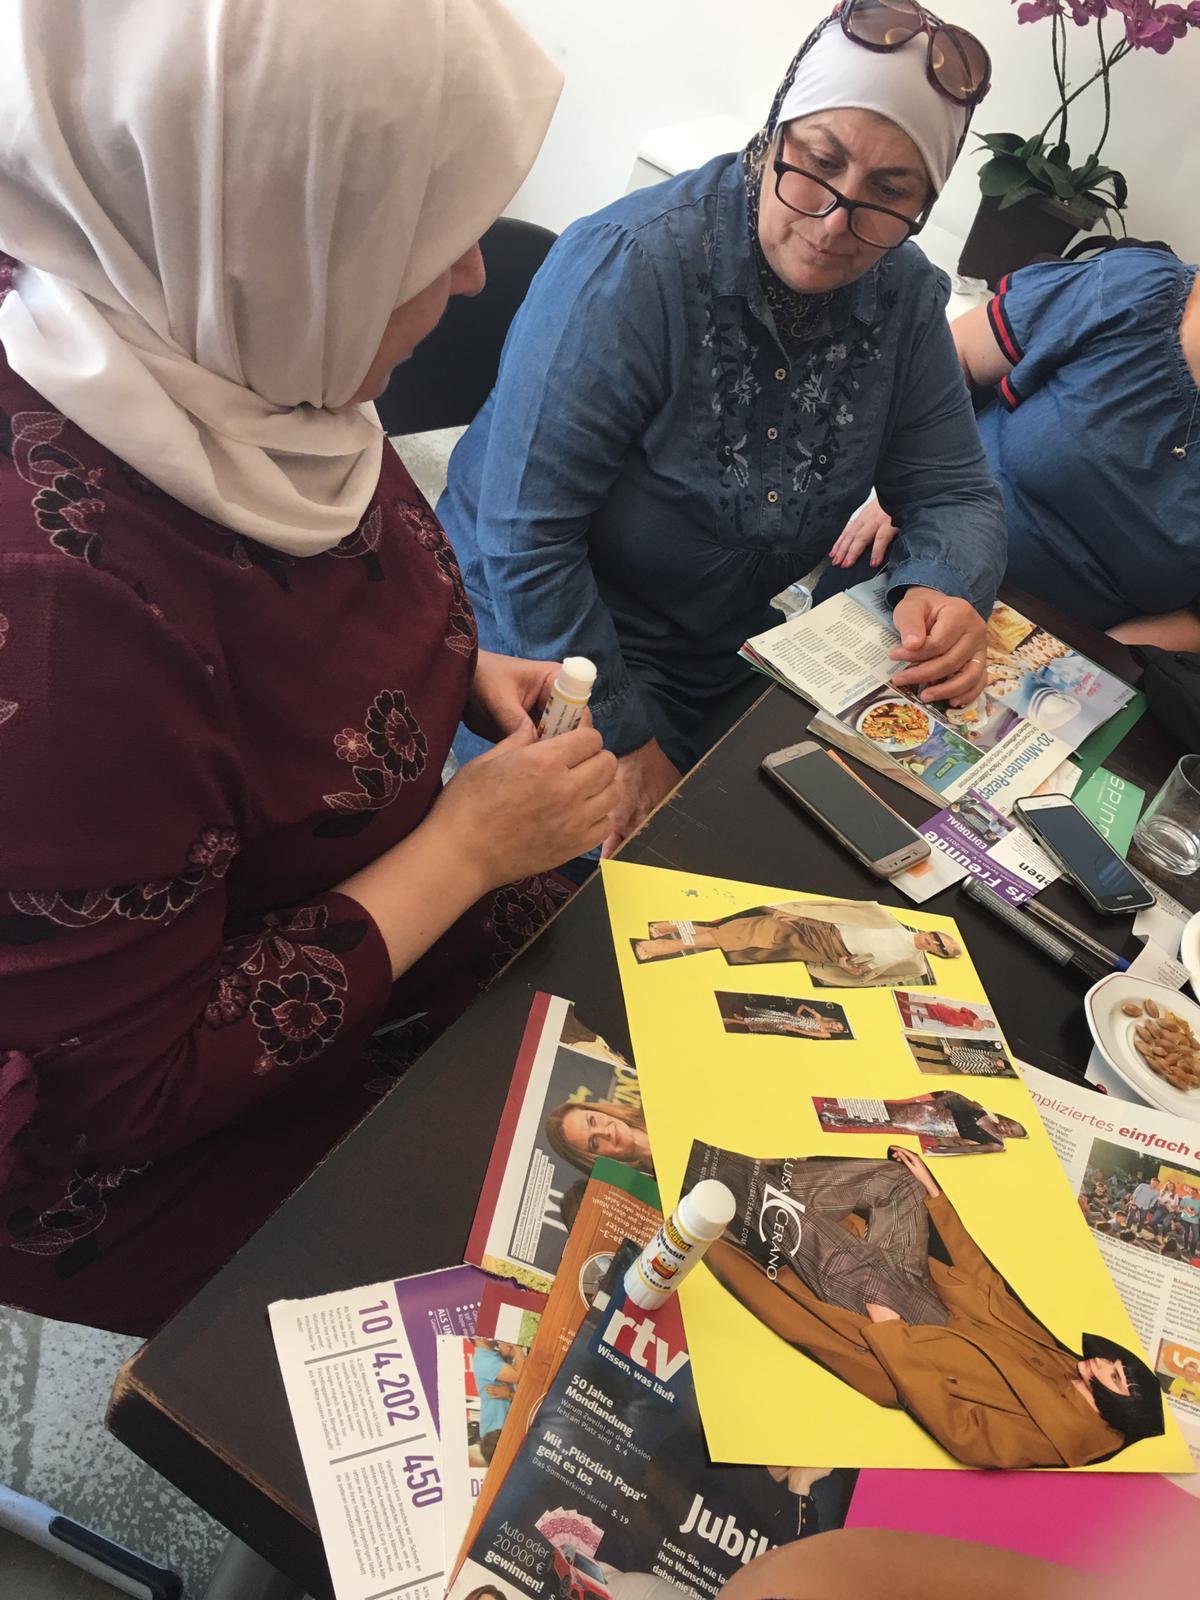 Flüchtlingspaten-Empowerment-Crew